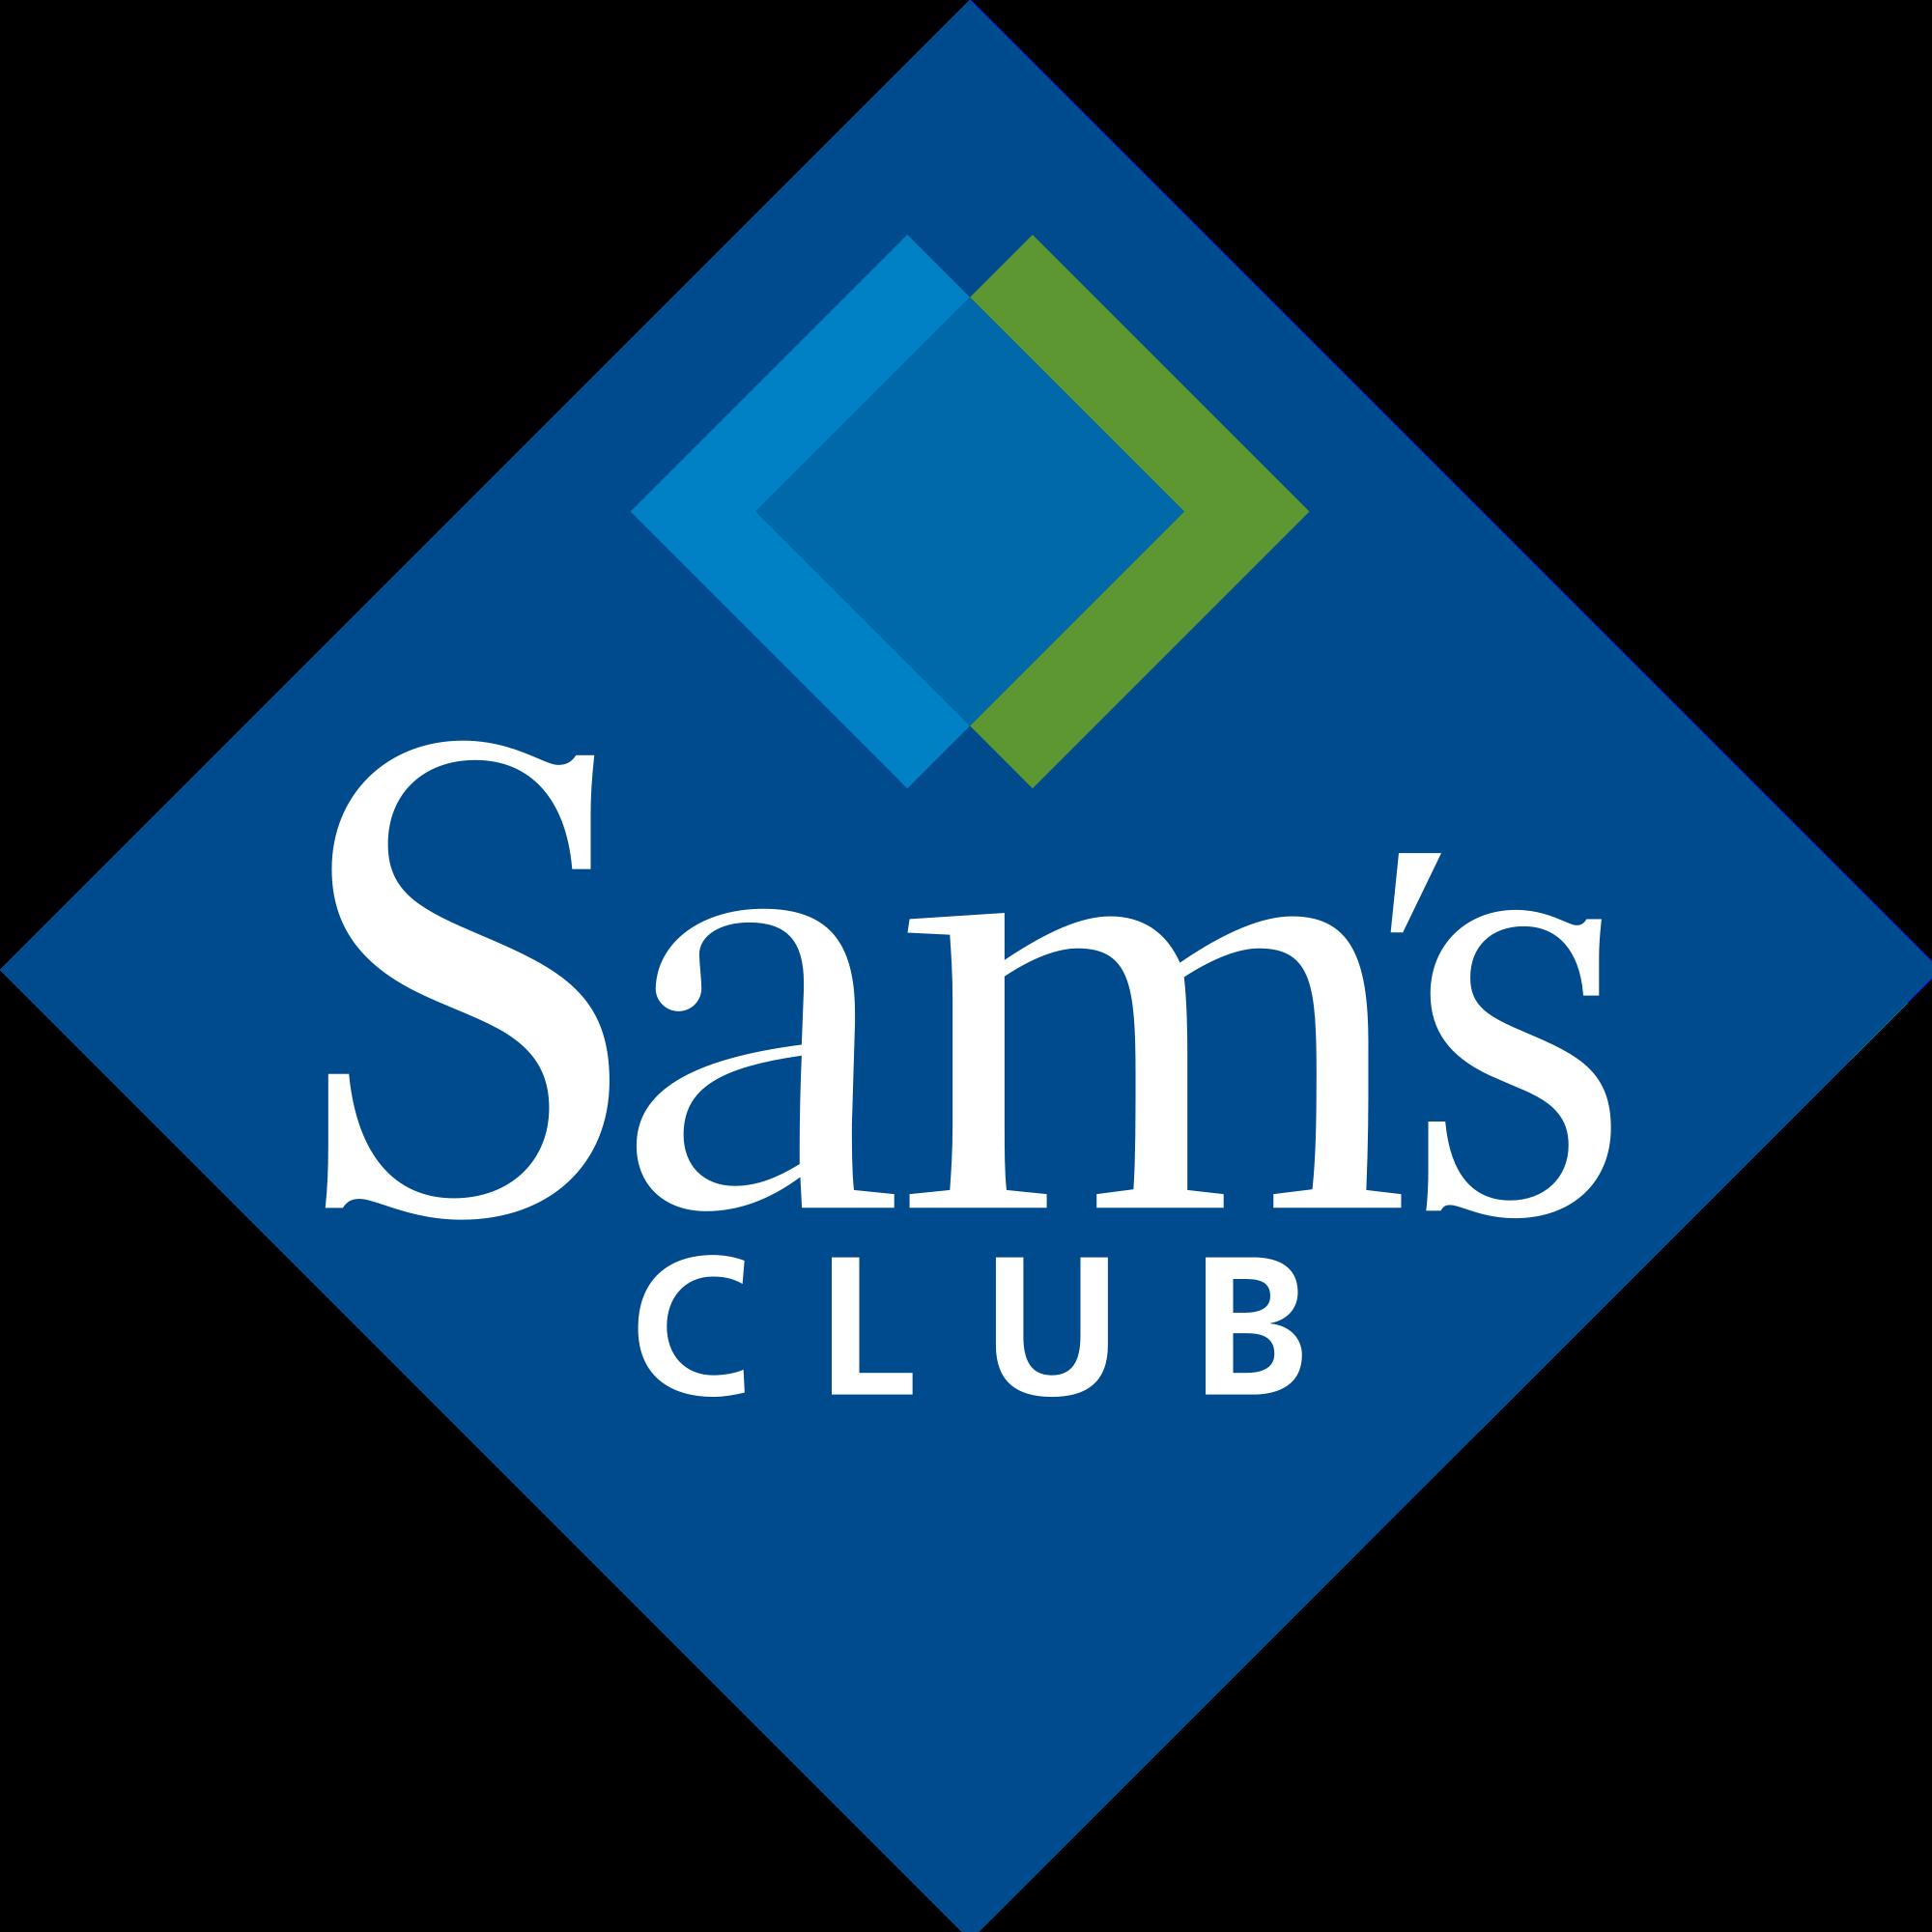 Sam's Club Half Price for One Year Membership. $22.50 Valid through 10/02/16